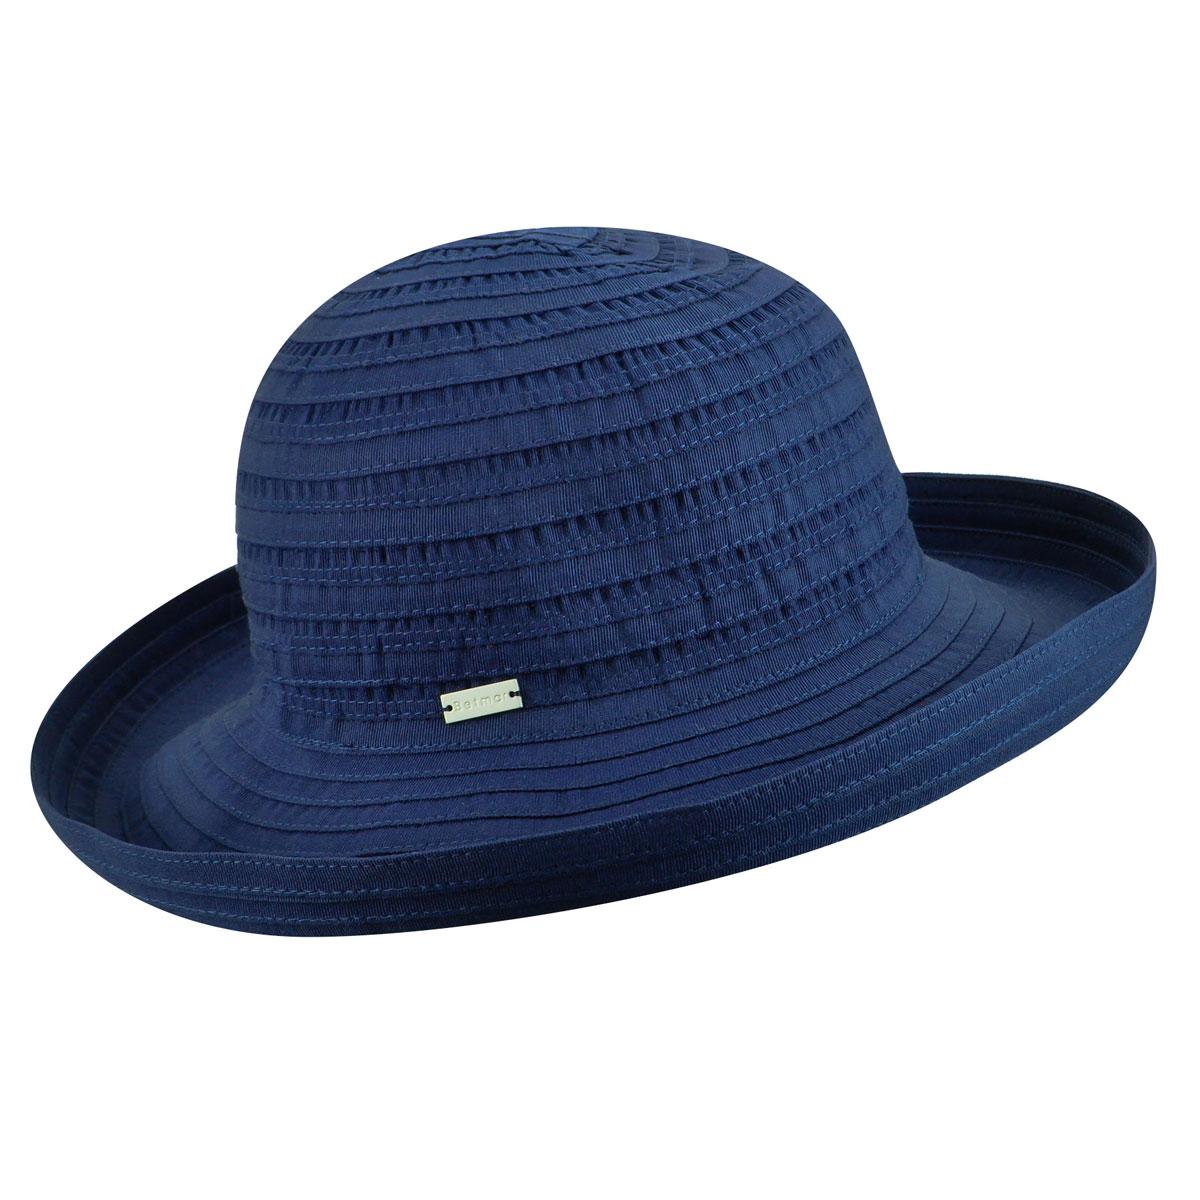 Betmar Classic Sunshade Hat in Navy